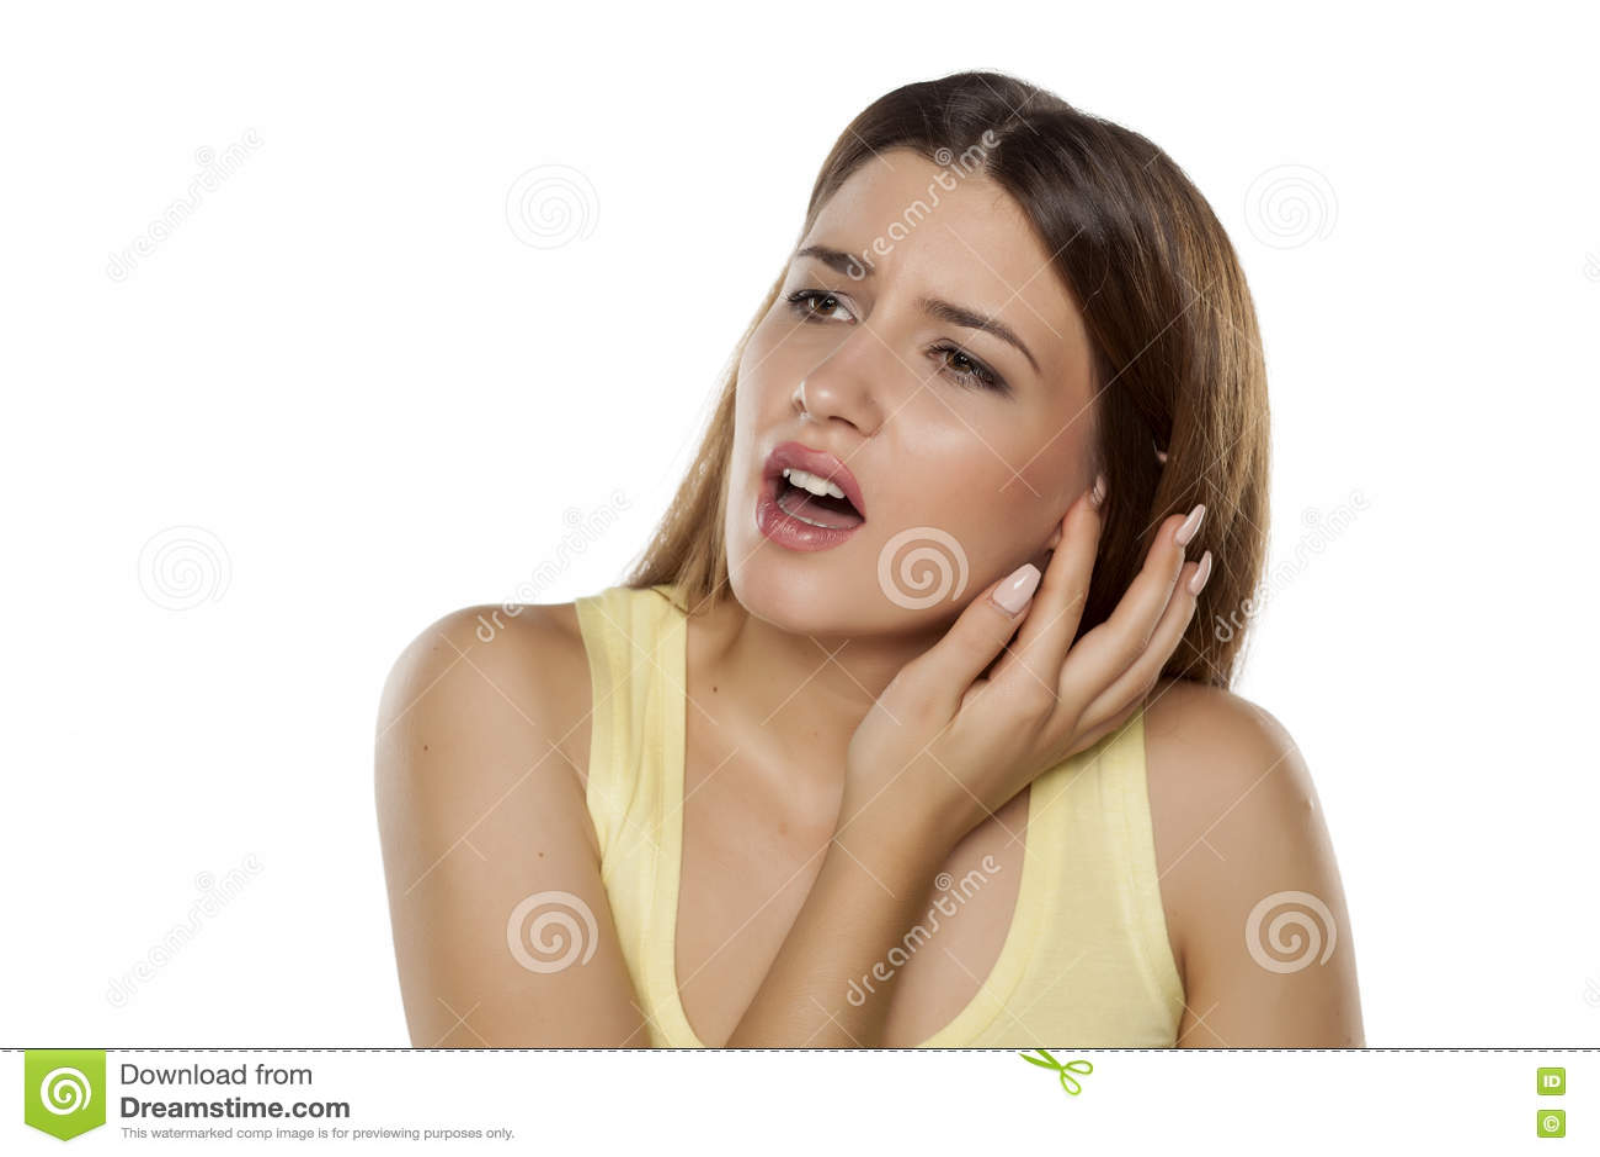 Painful ear